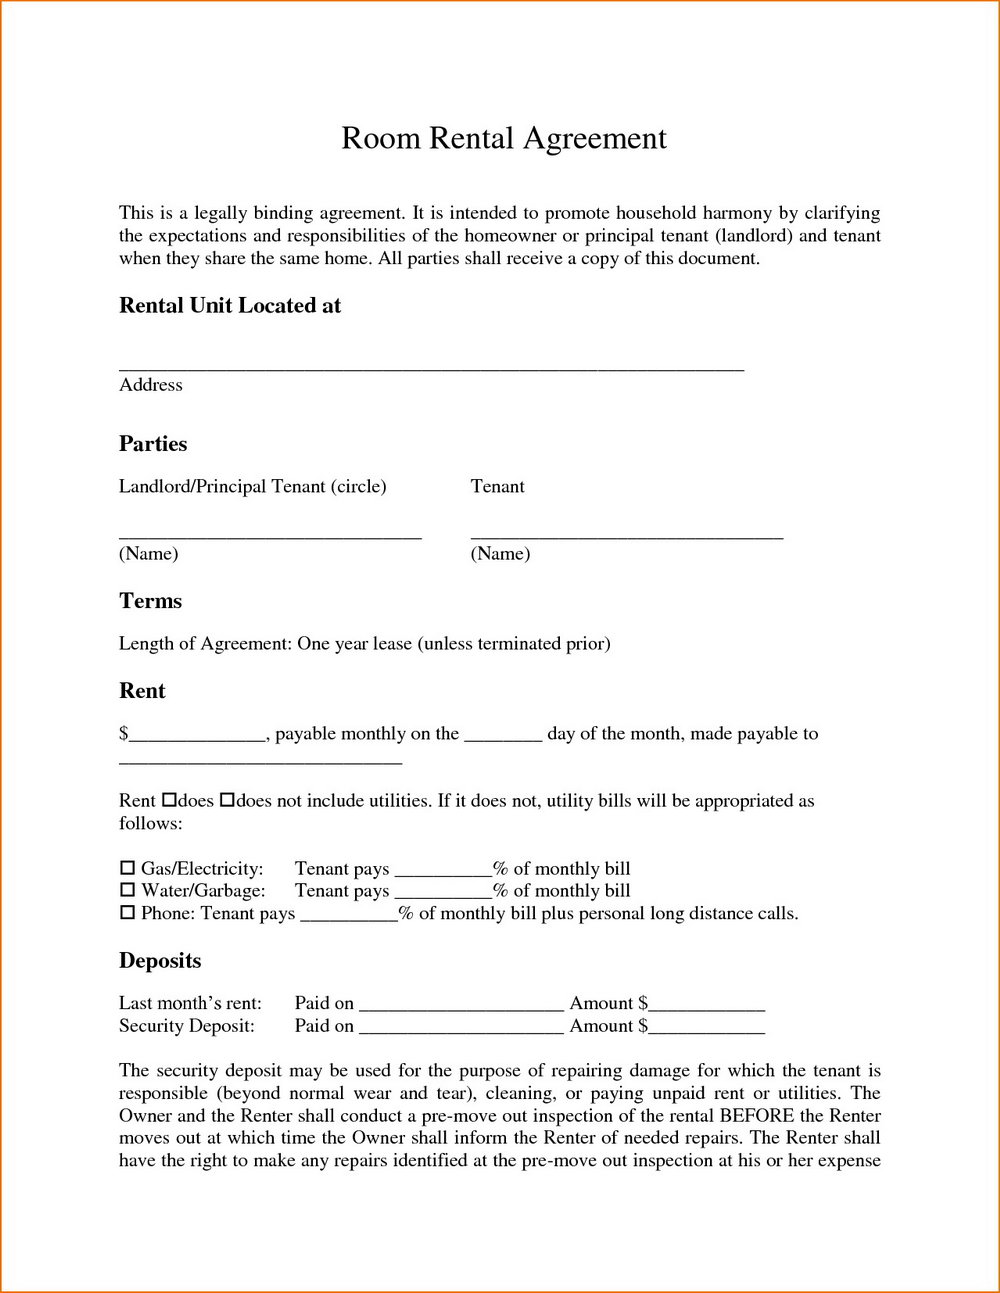 Room Rental Agreement Template Word Doc